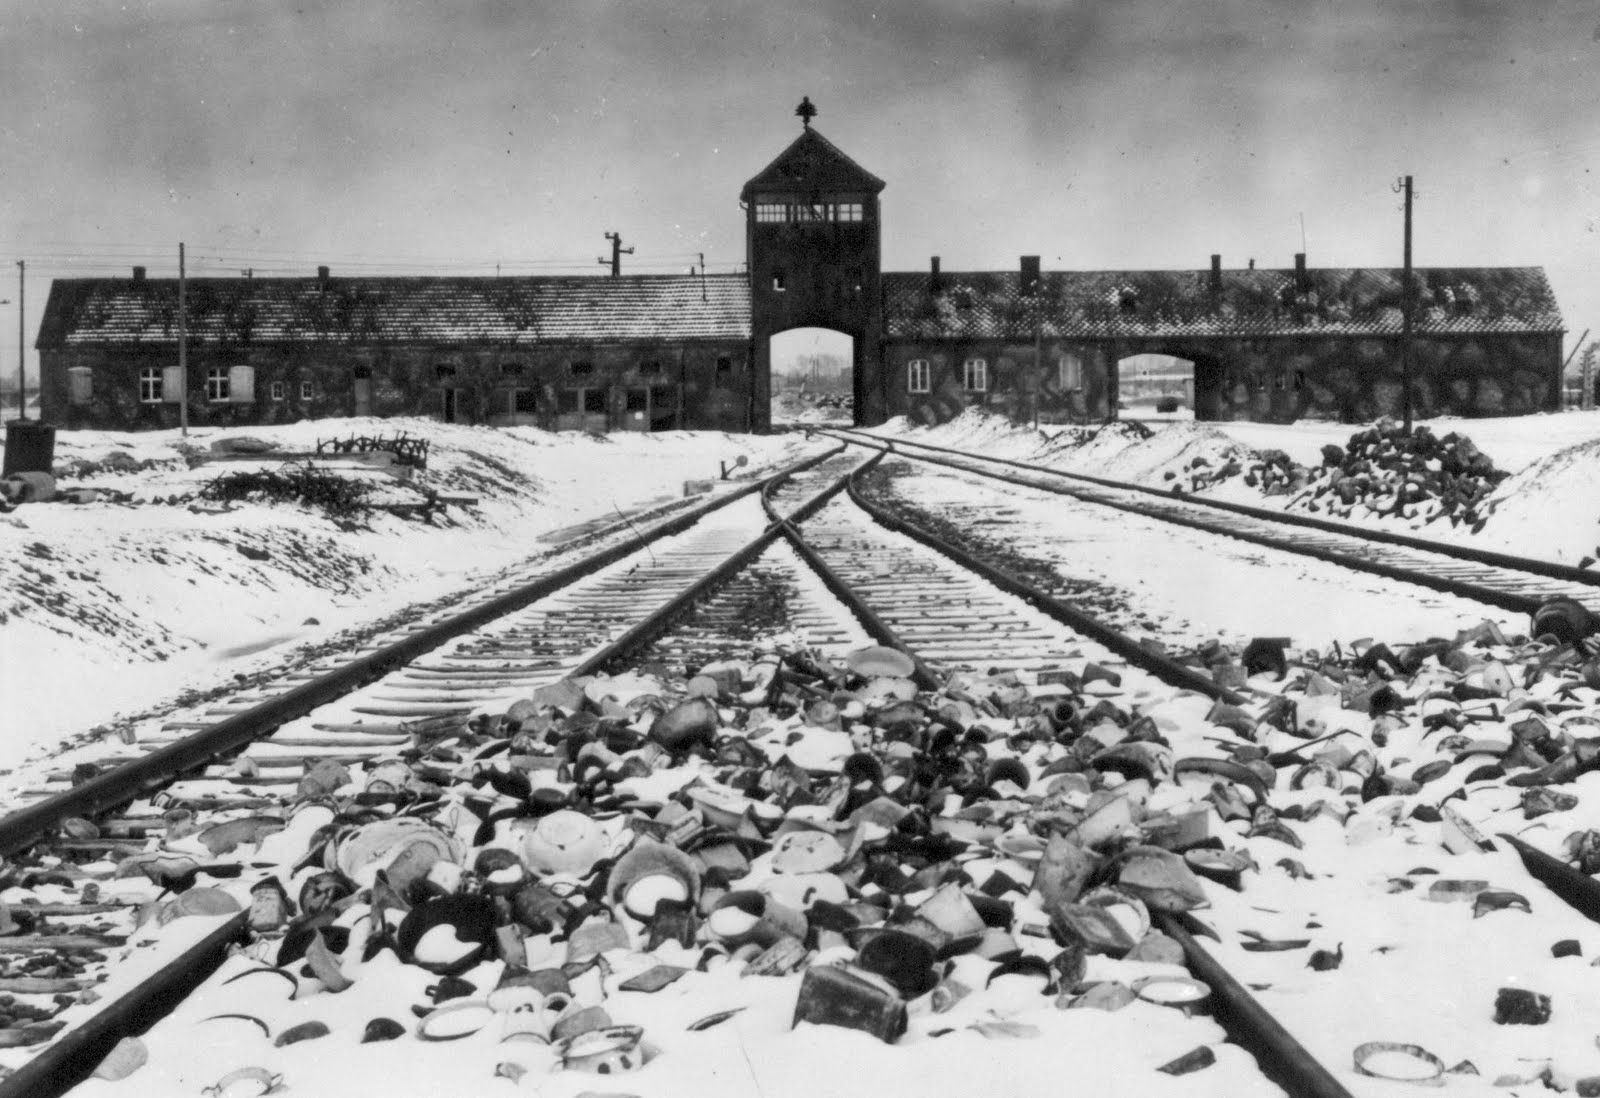 Auschwitz-Birkenau: Nazi Medical Experimentation